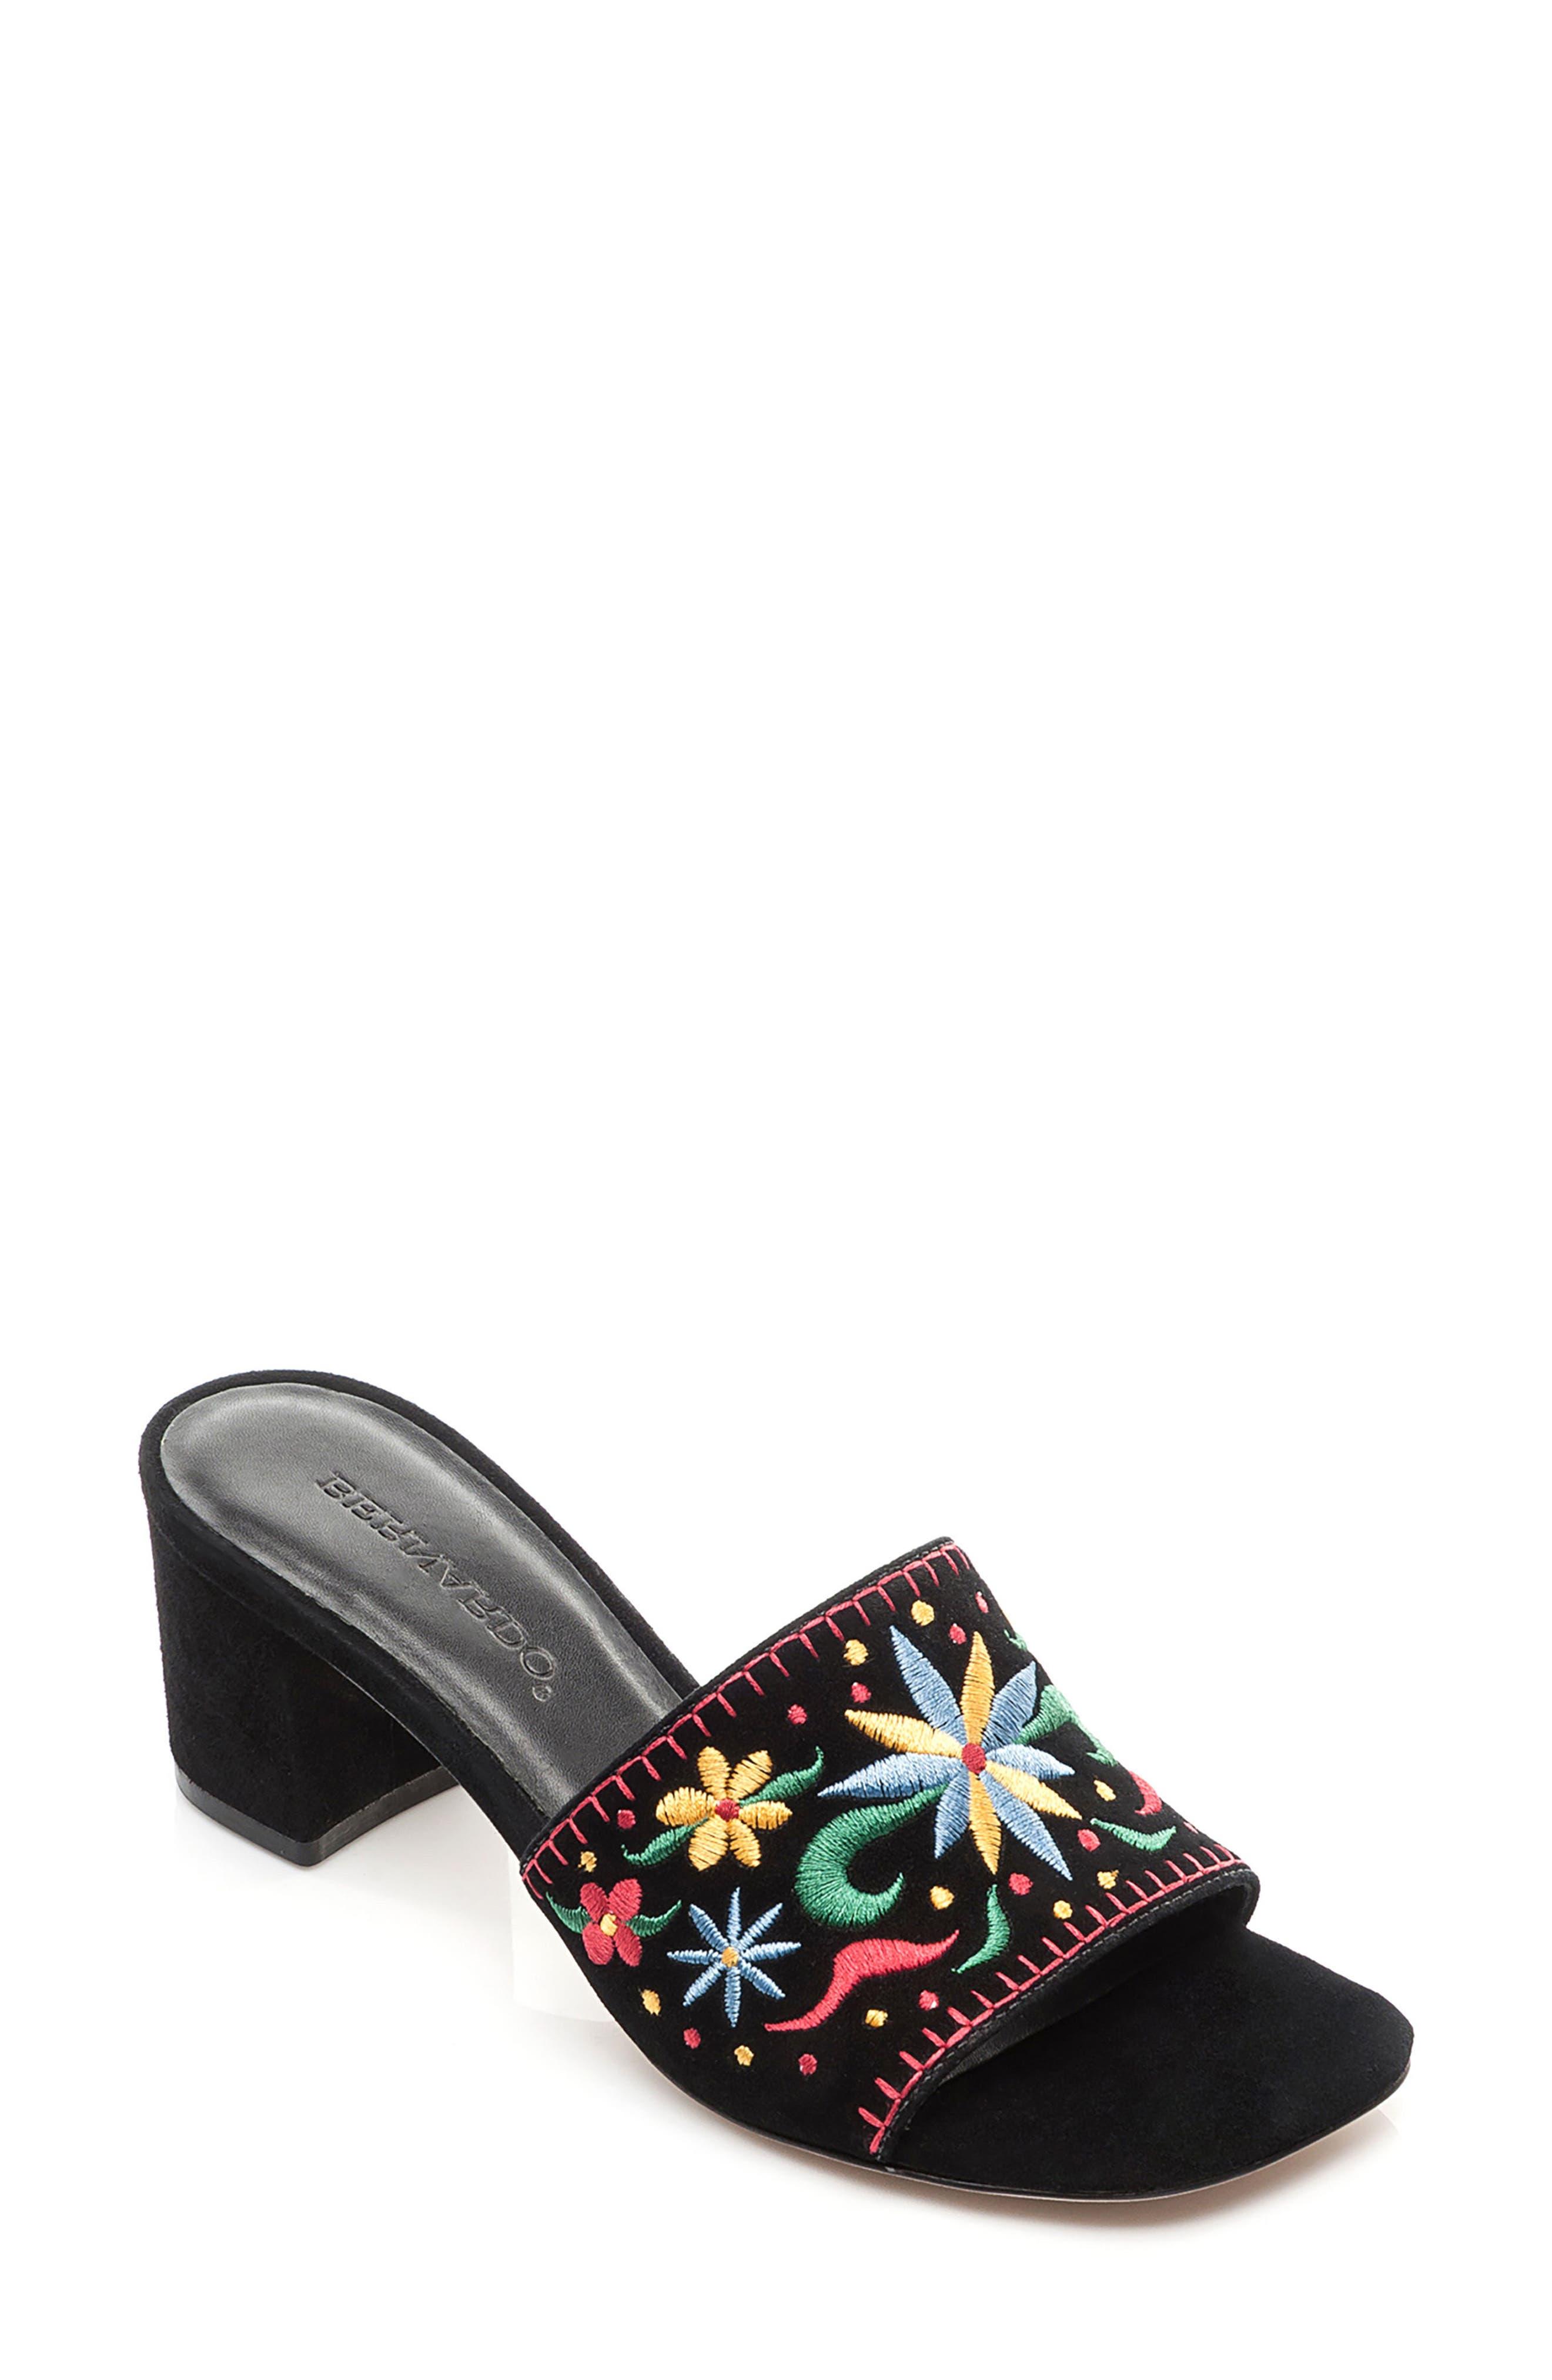 BERNARDO FOOTWEAR Bailey Slide Sandal